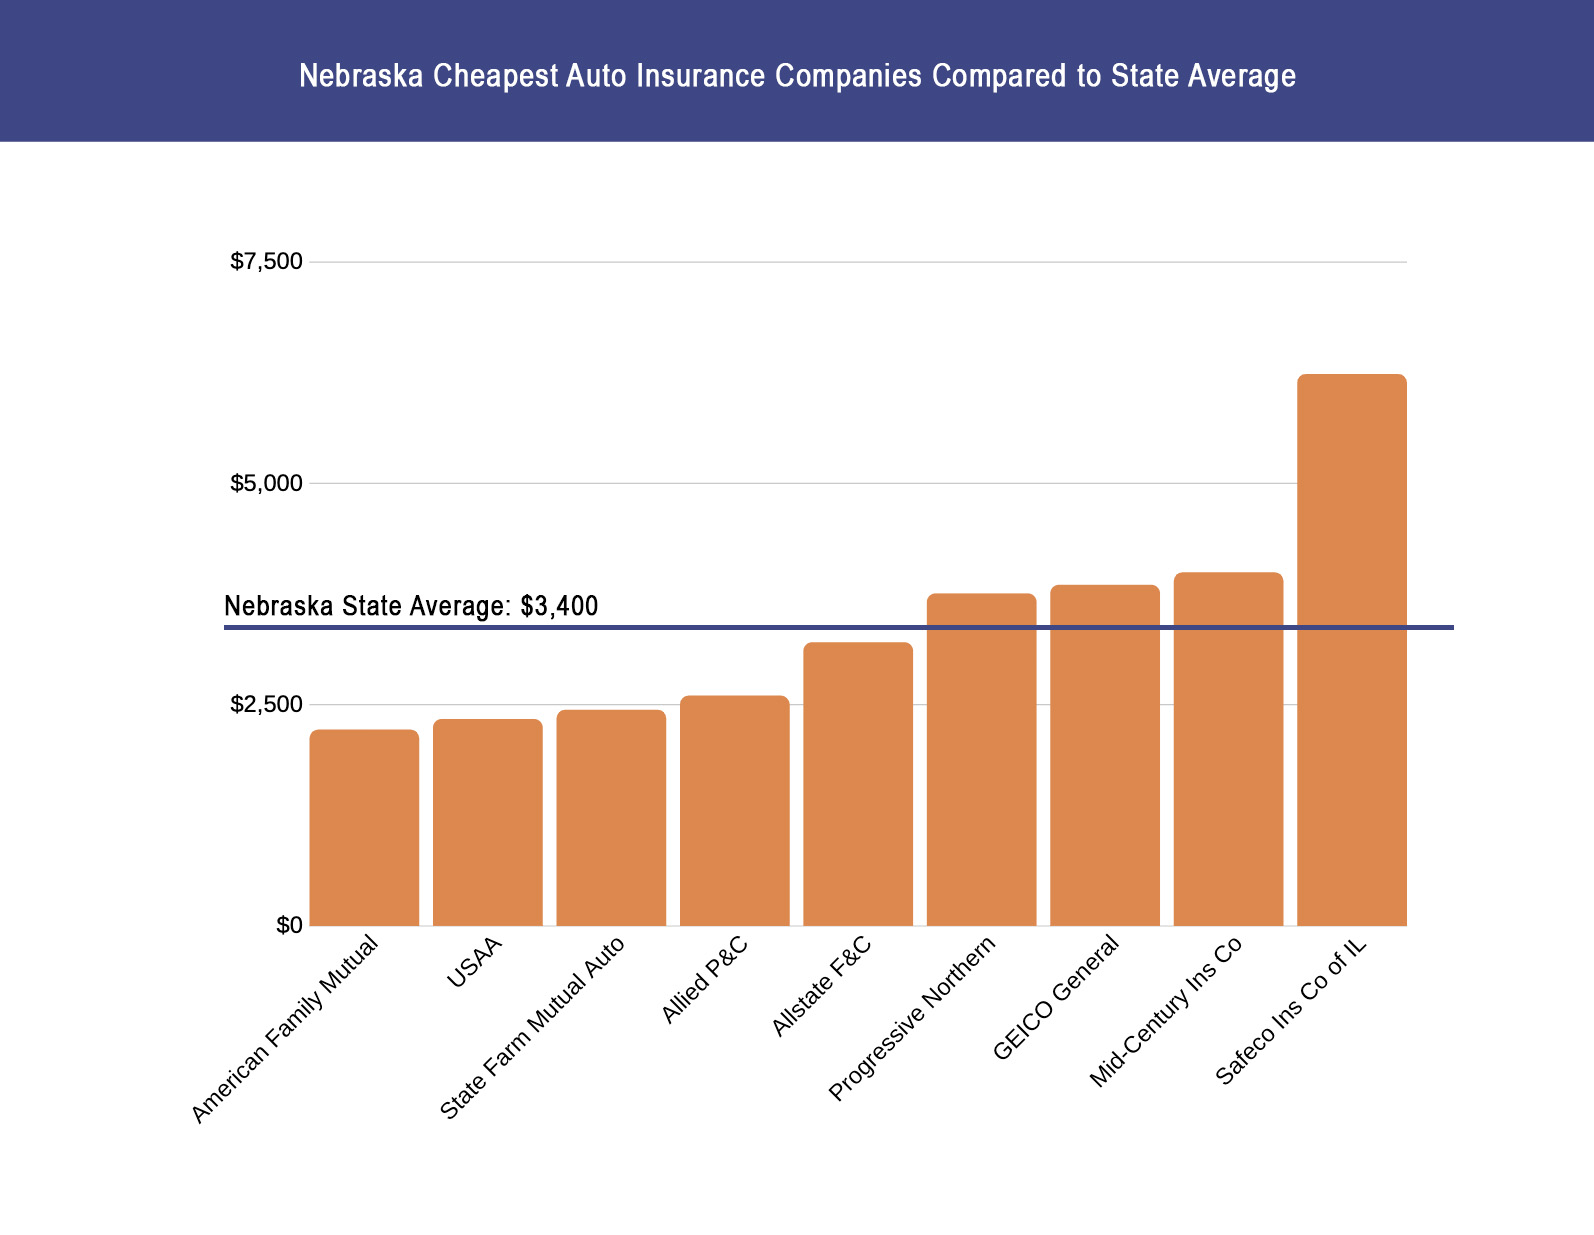 Nebraska Cheapest Auto Insurance Companies Compared to State Average